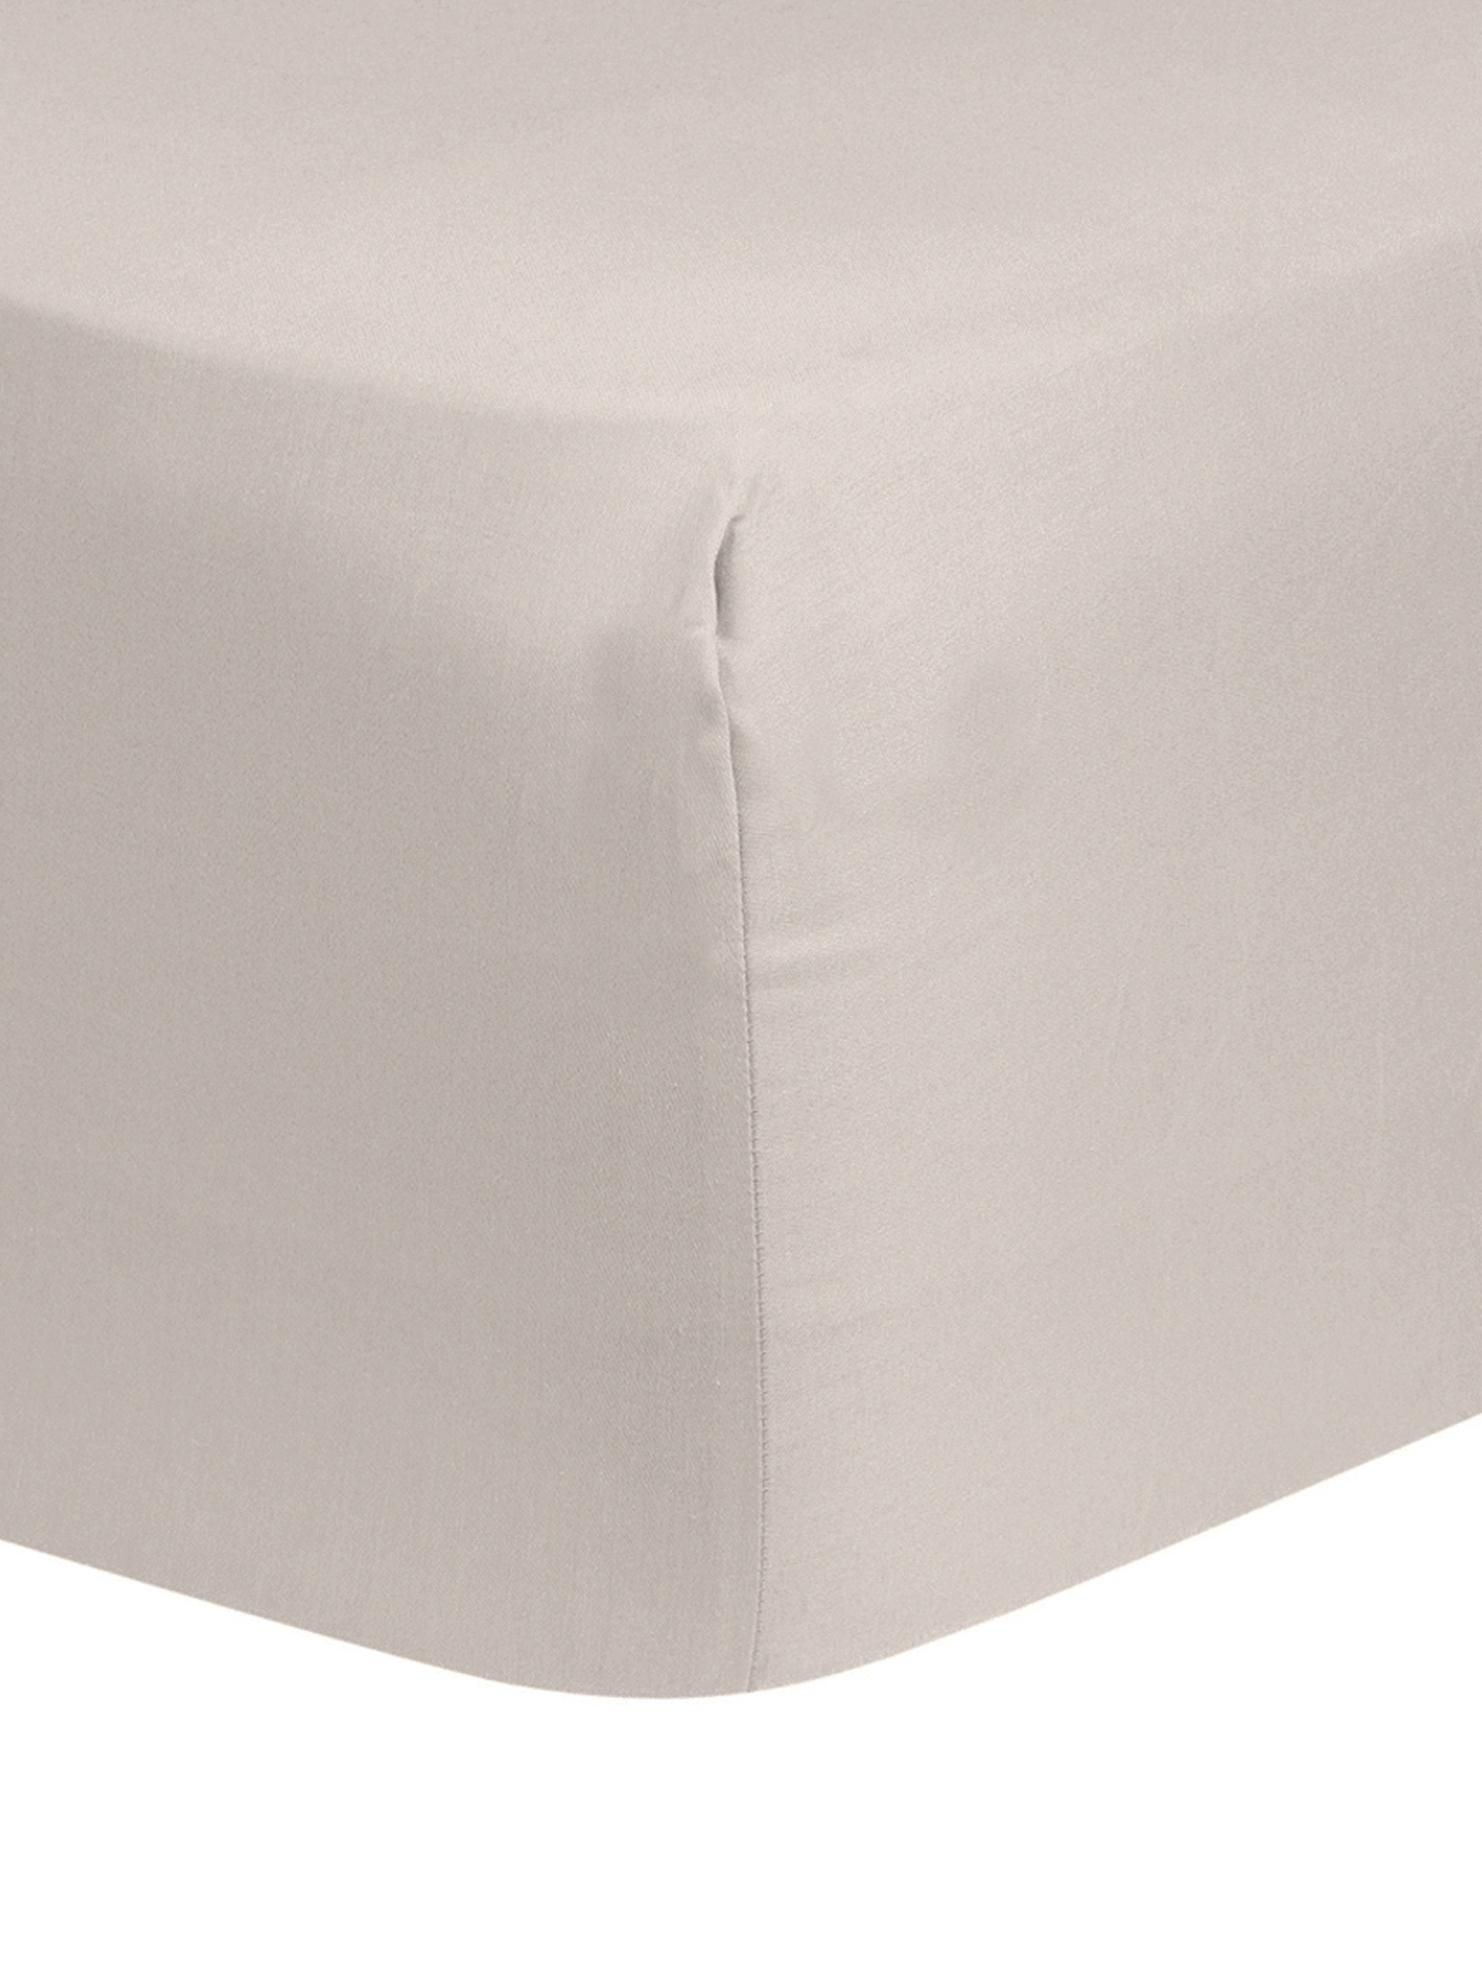 Sábana bajera para boxspring de algodón Comfort, Gris pardo, Cama 150 cm (160 x 200 cm)